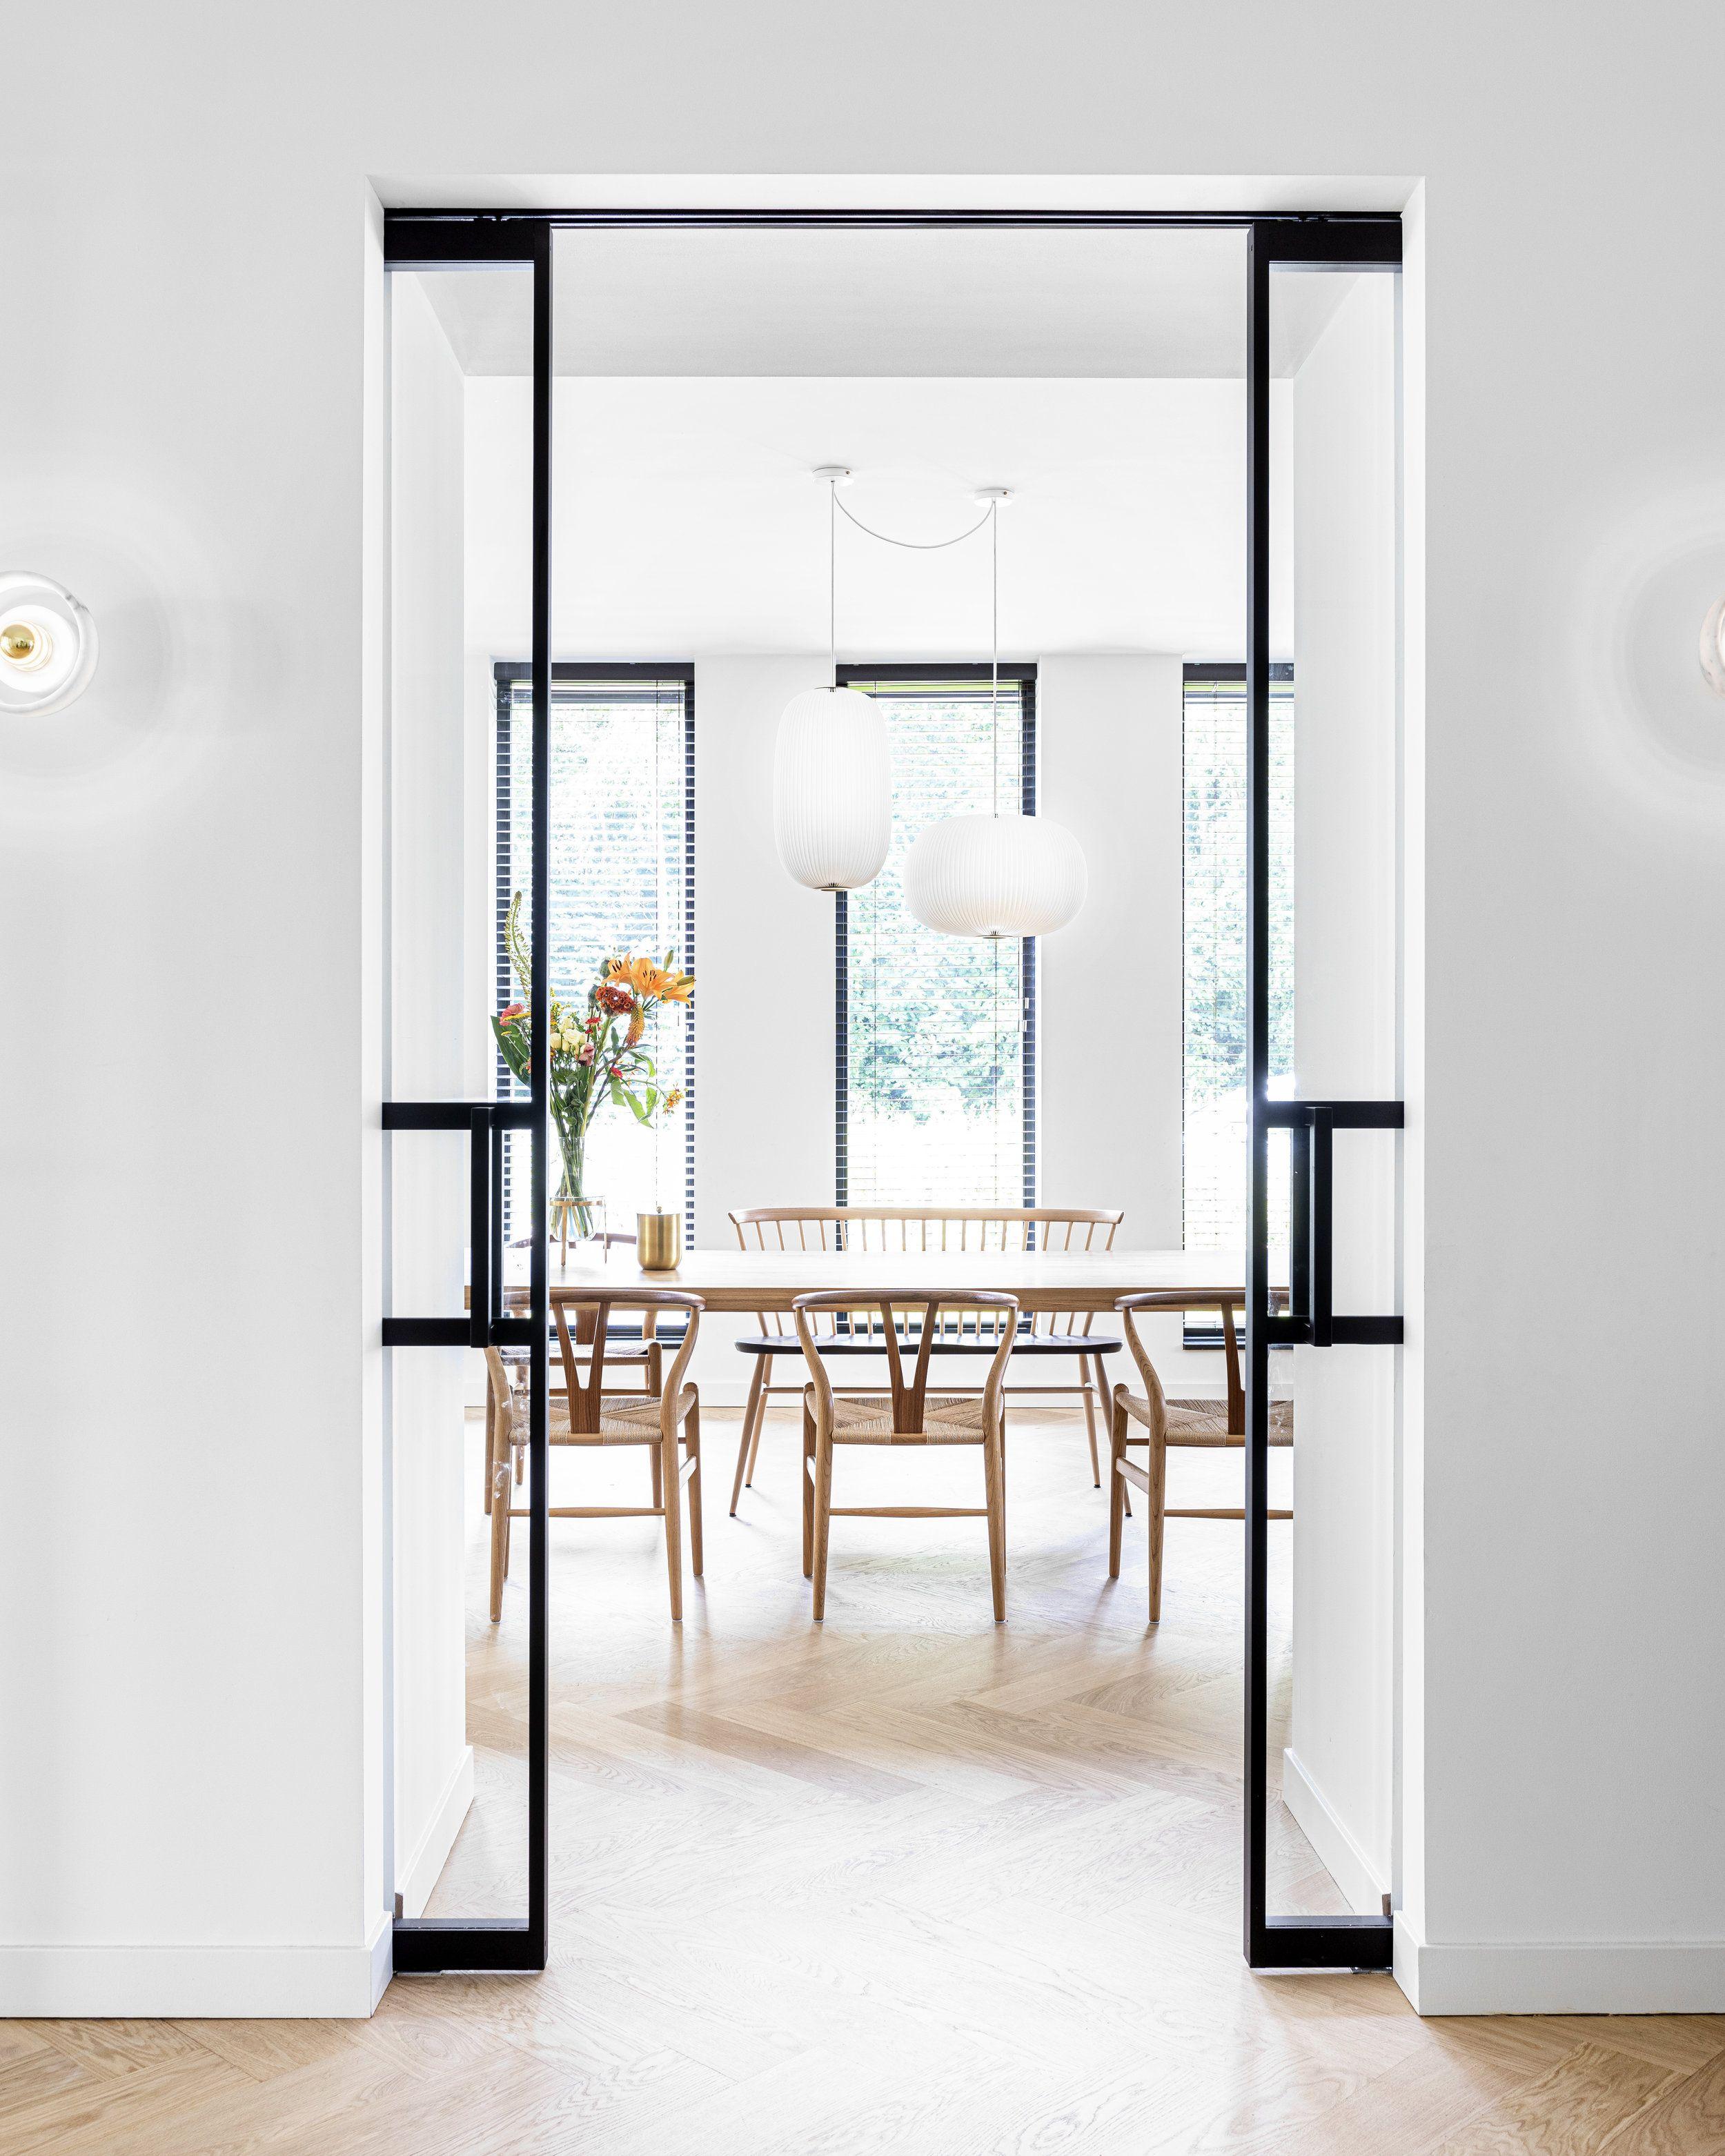 Scandinavian Living A Warm Family Home April And May In 2020 Home Scandinavian Living Home And Living